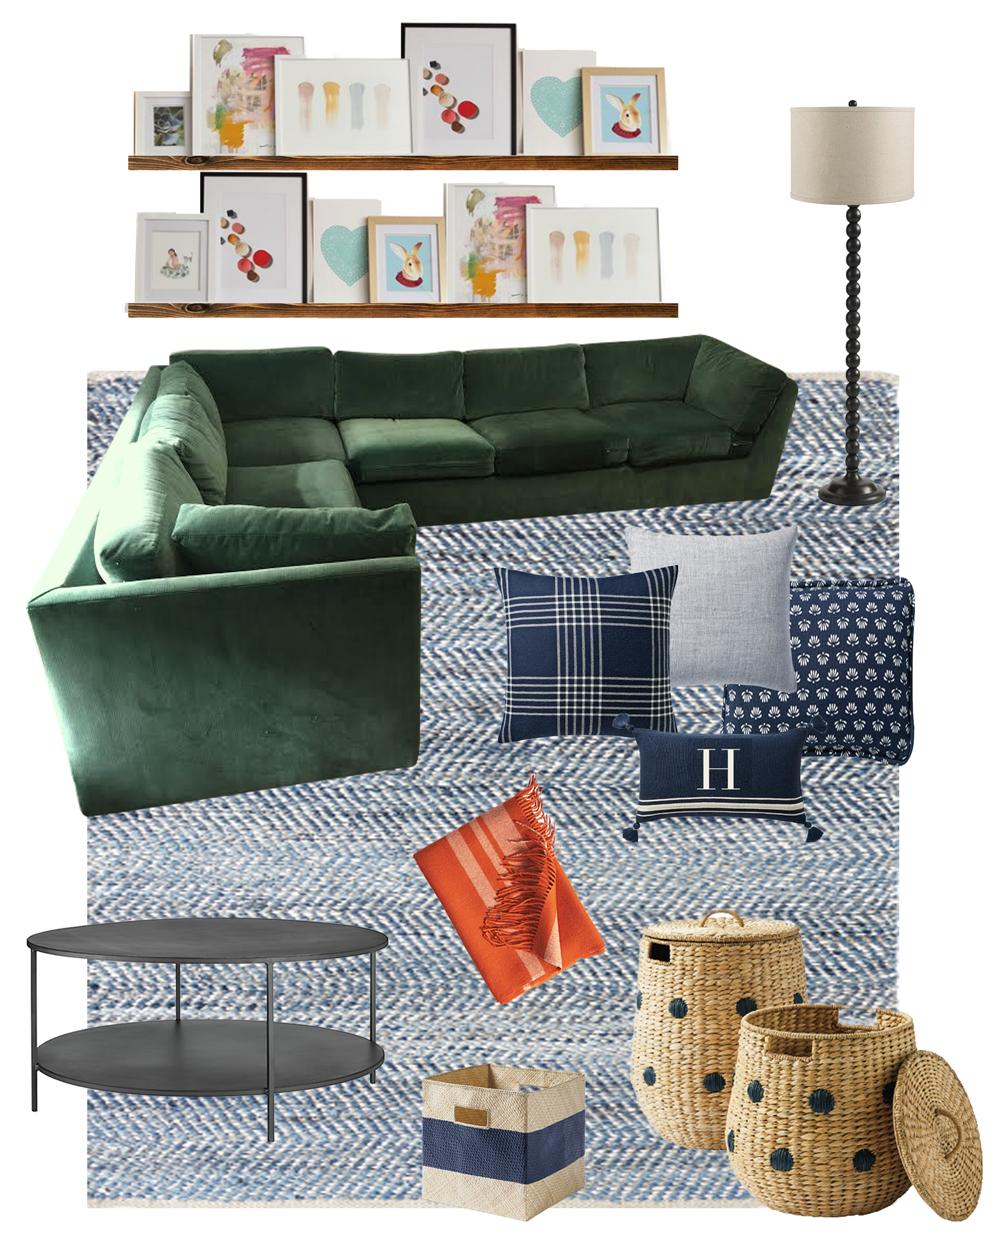 Harris-House_Playroom.png